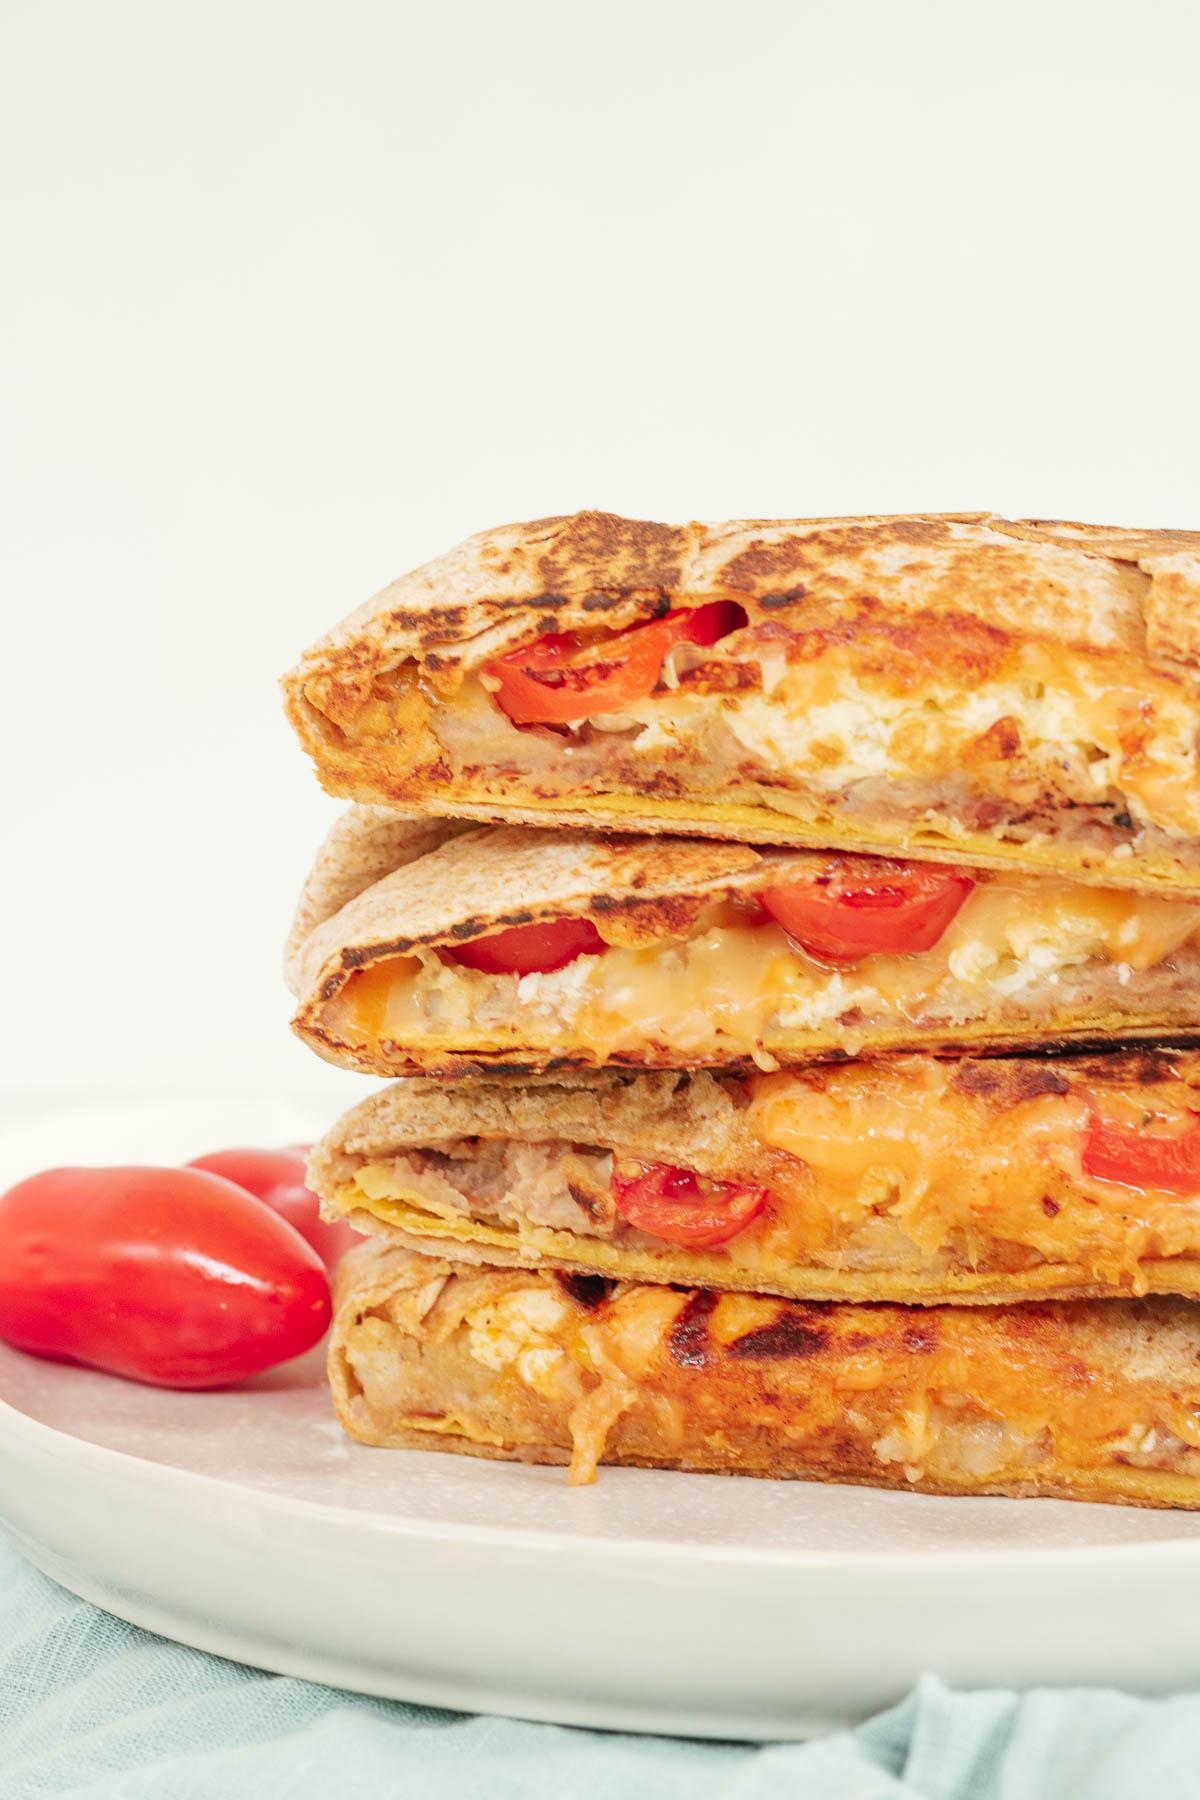 Breakfast Crunchwrap on a plate